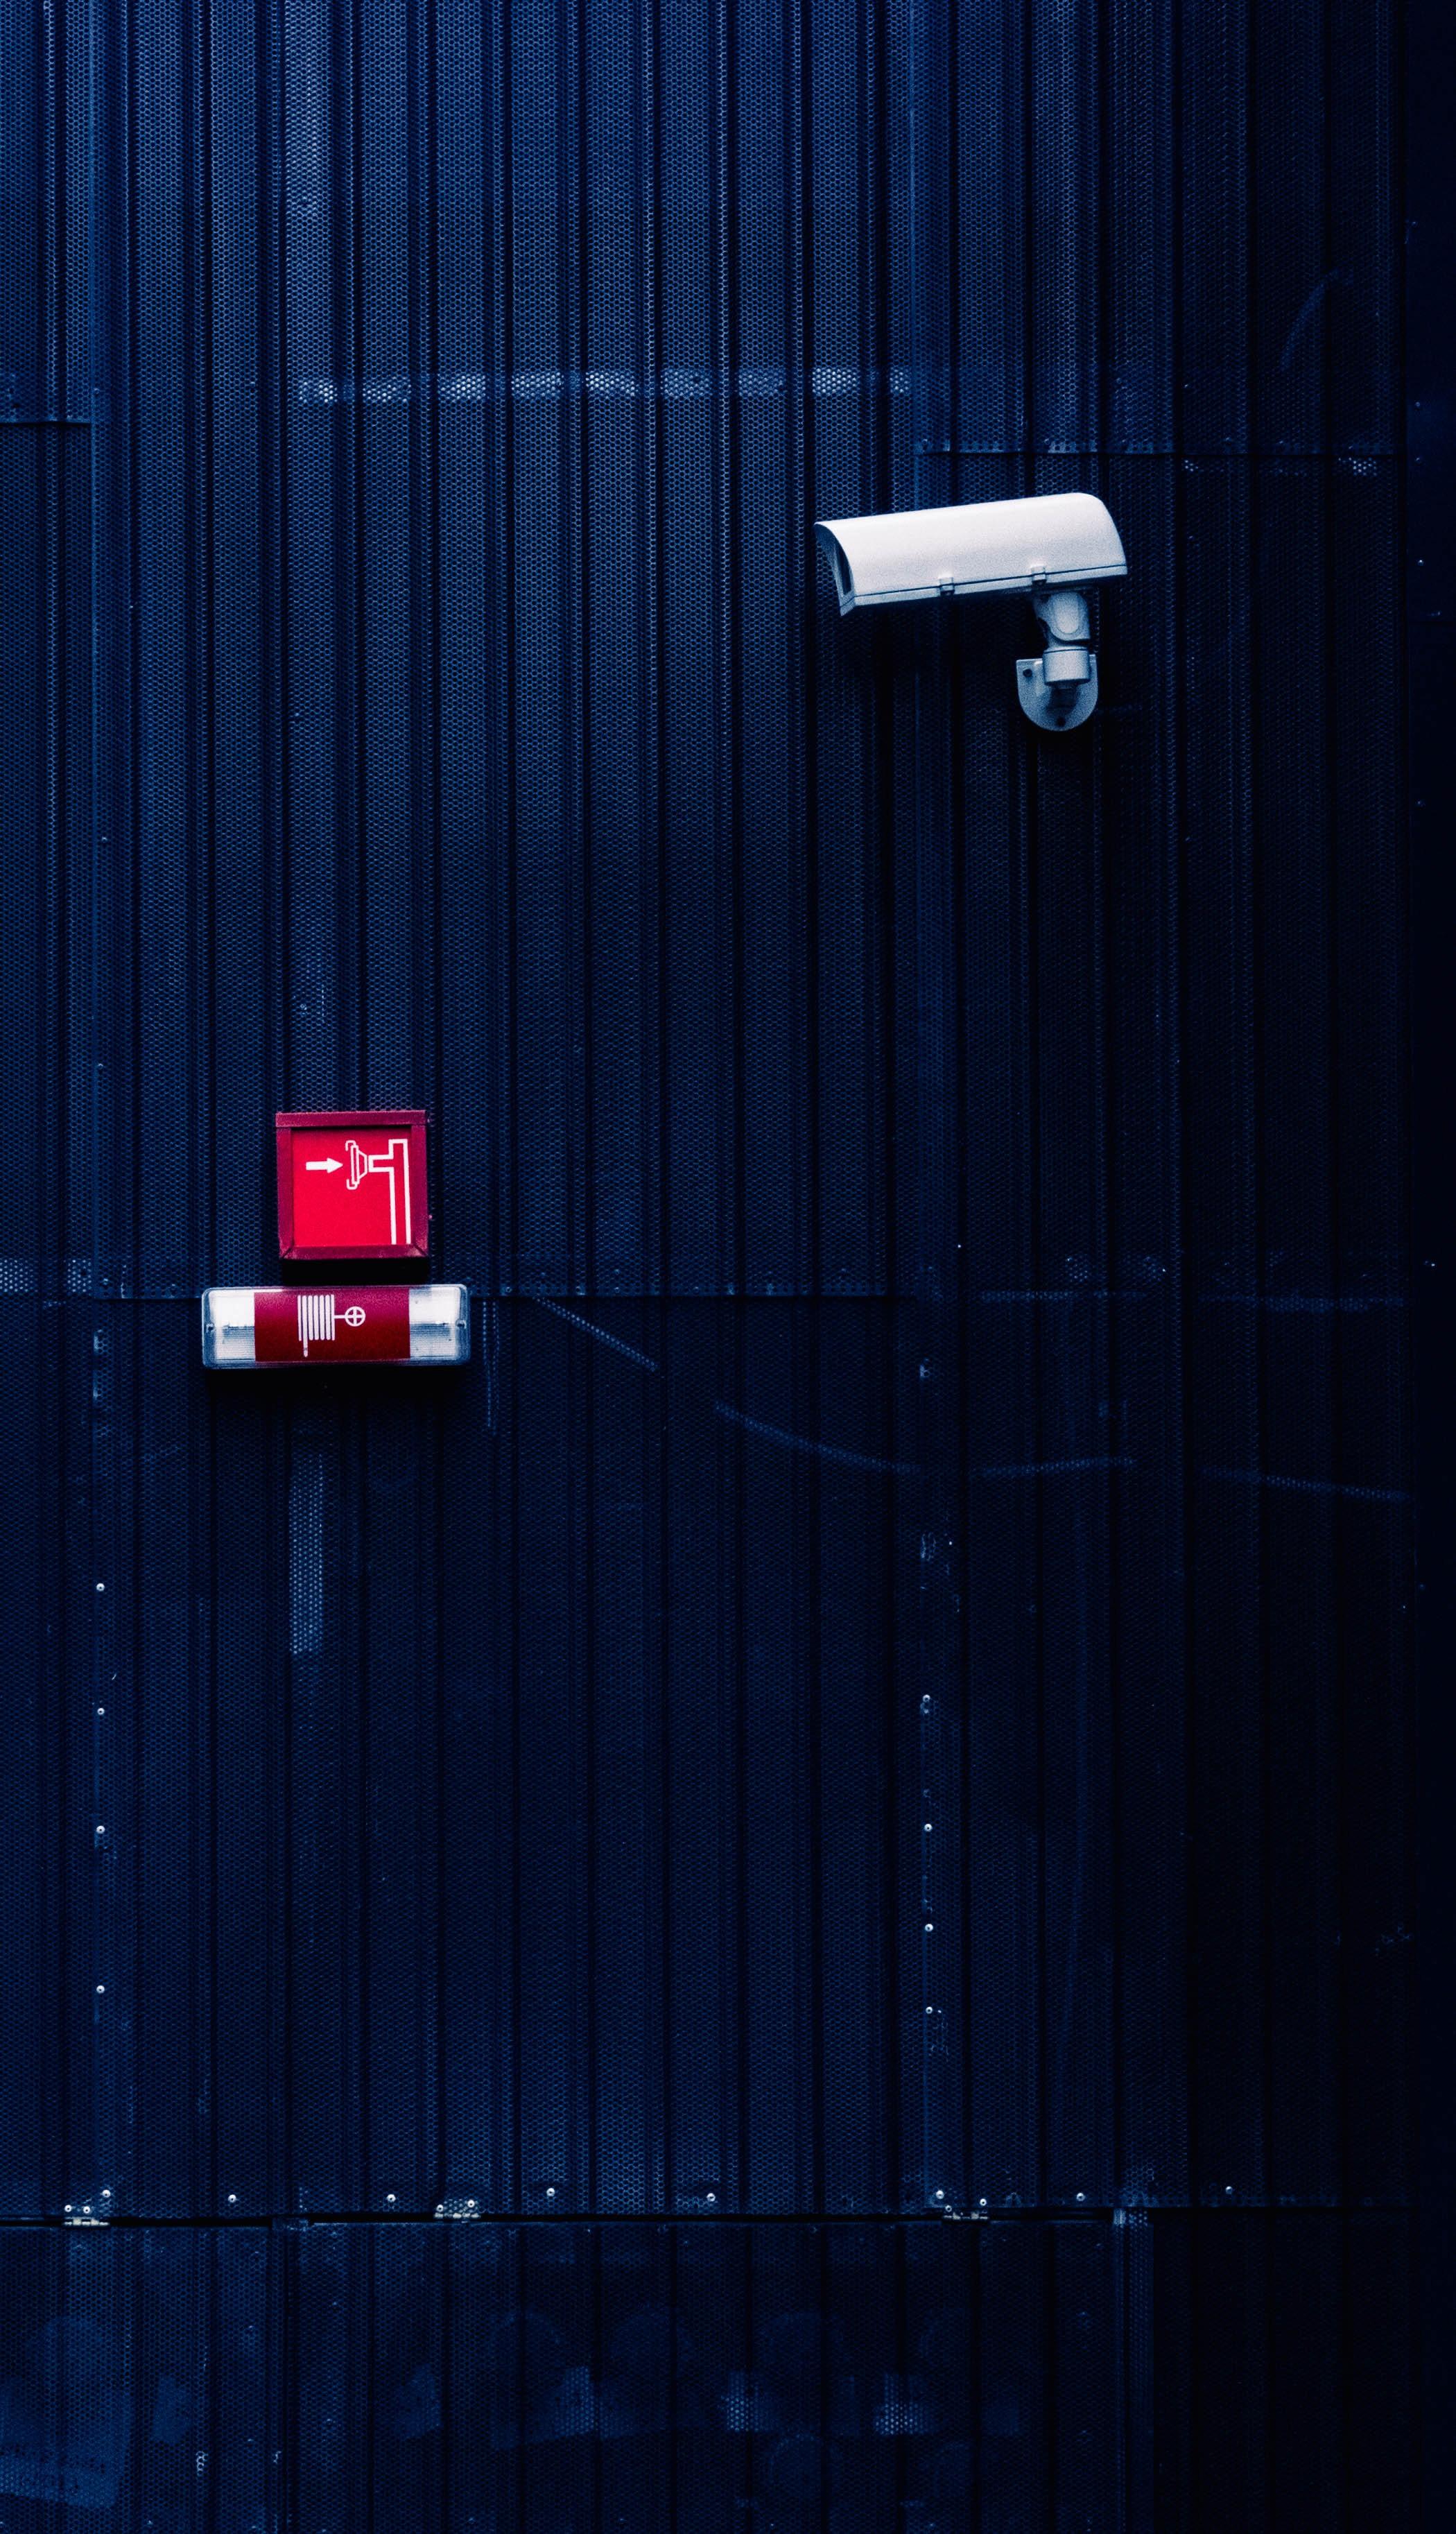 dark-electronic-equipment-modern-776516